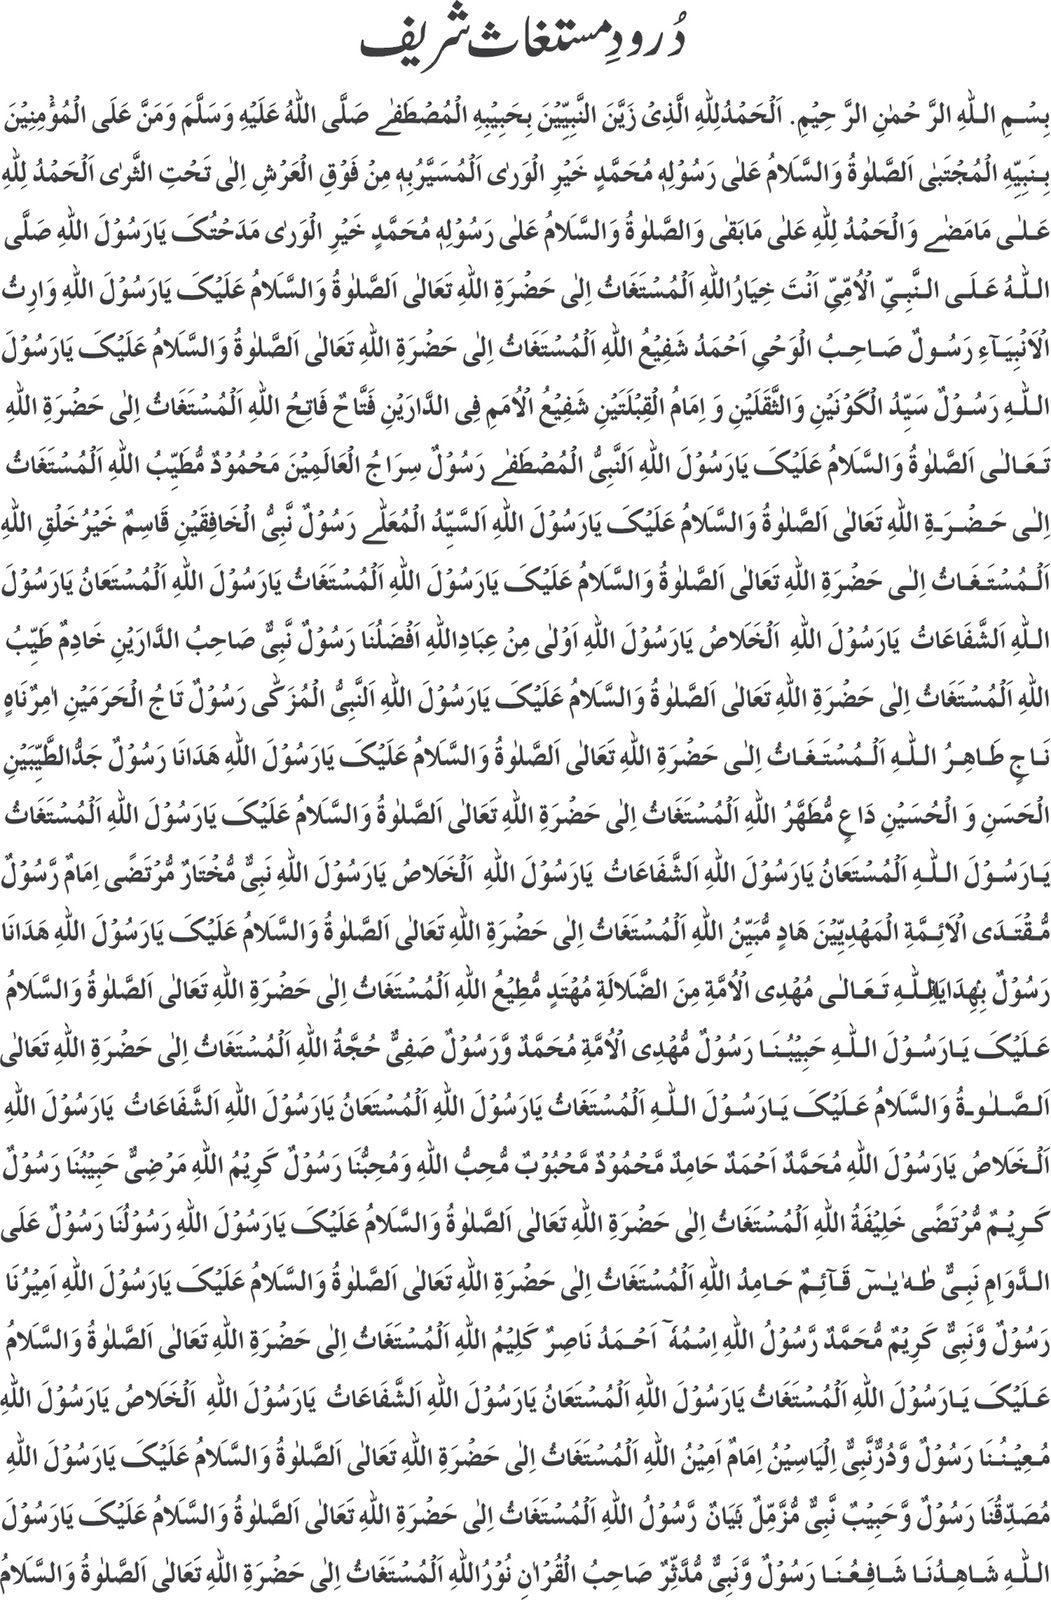 Eid ul fitr essay pdf